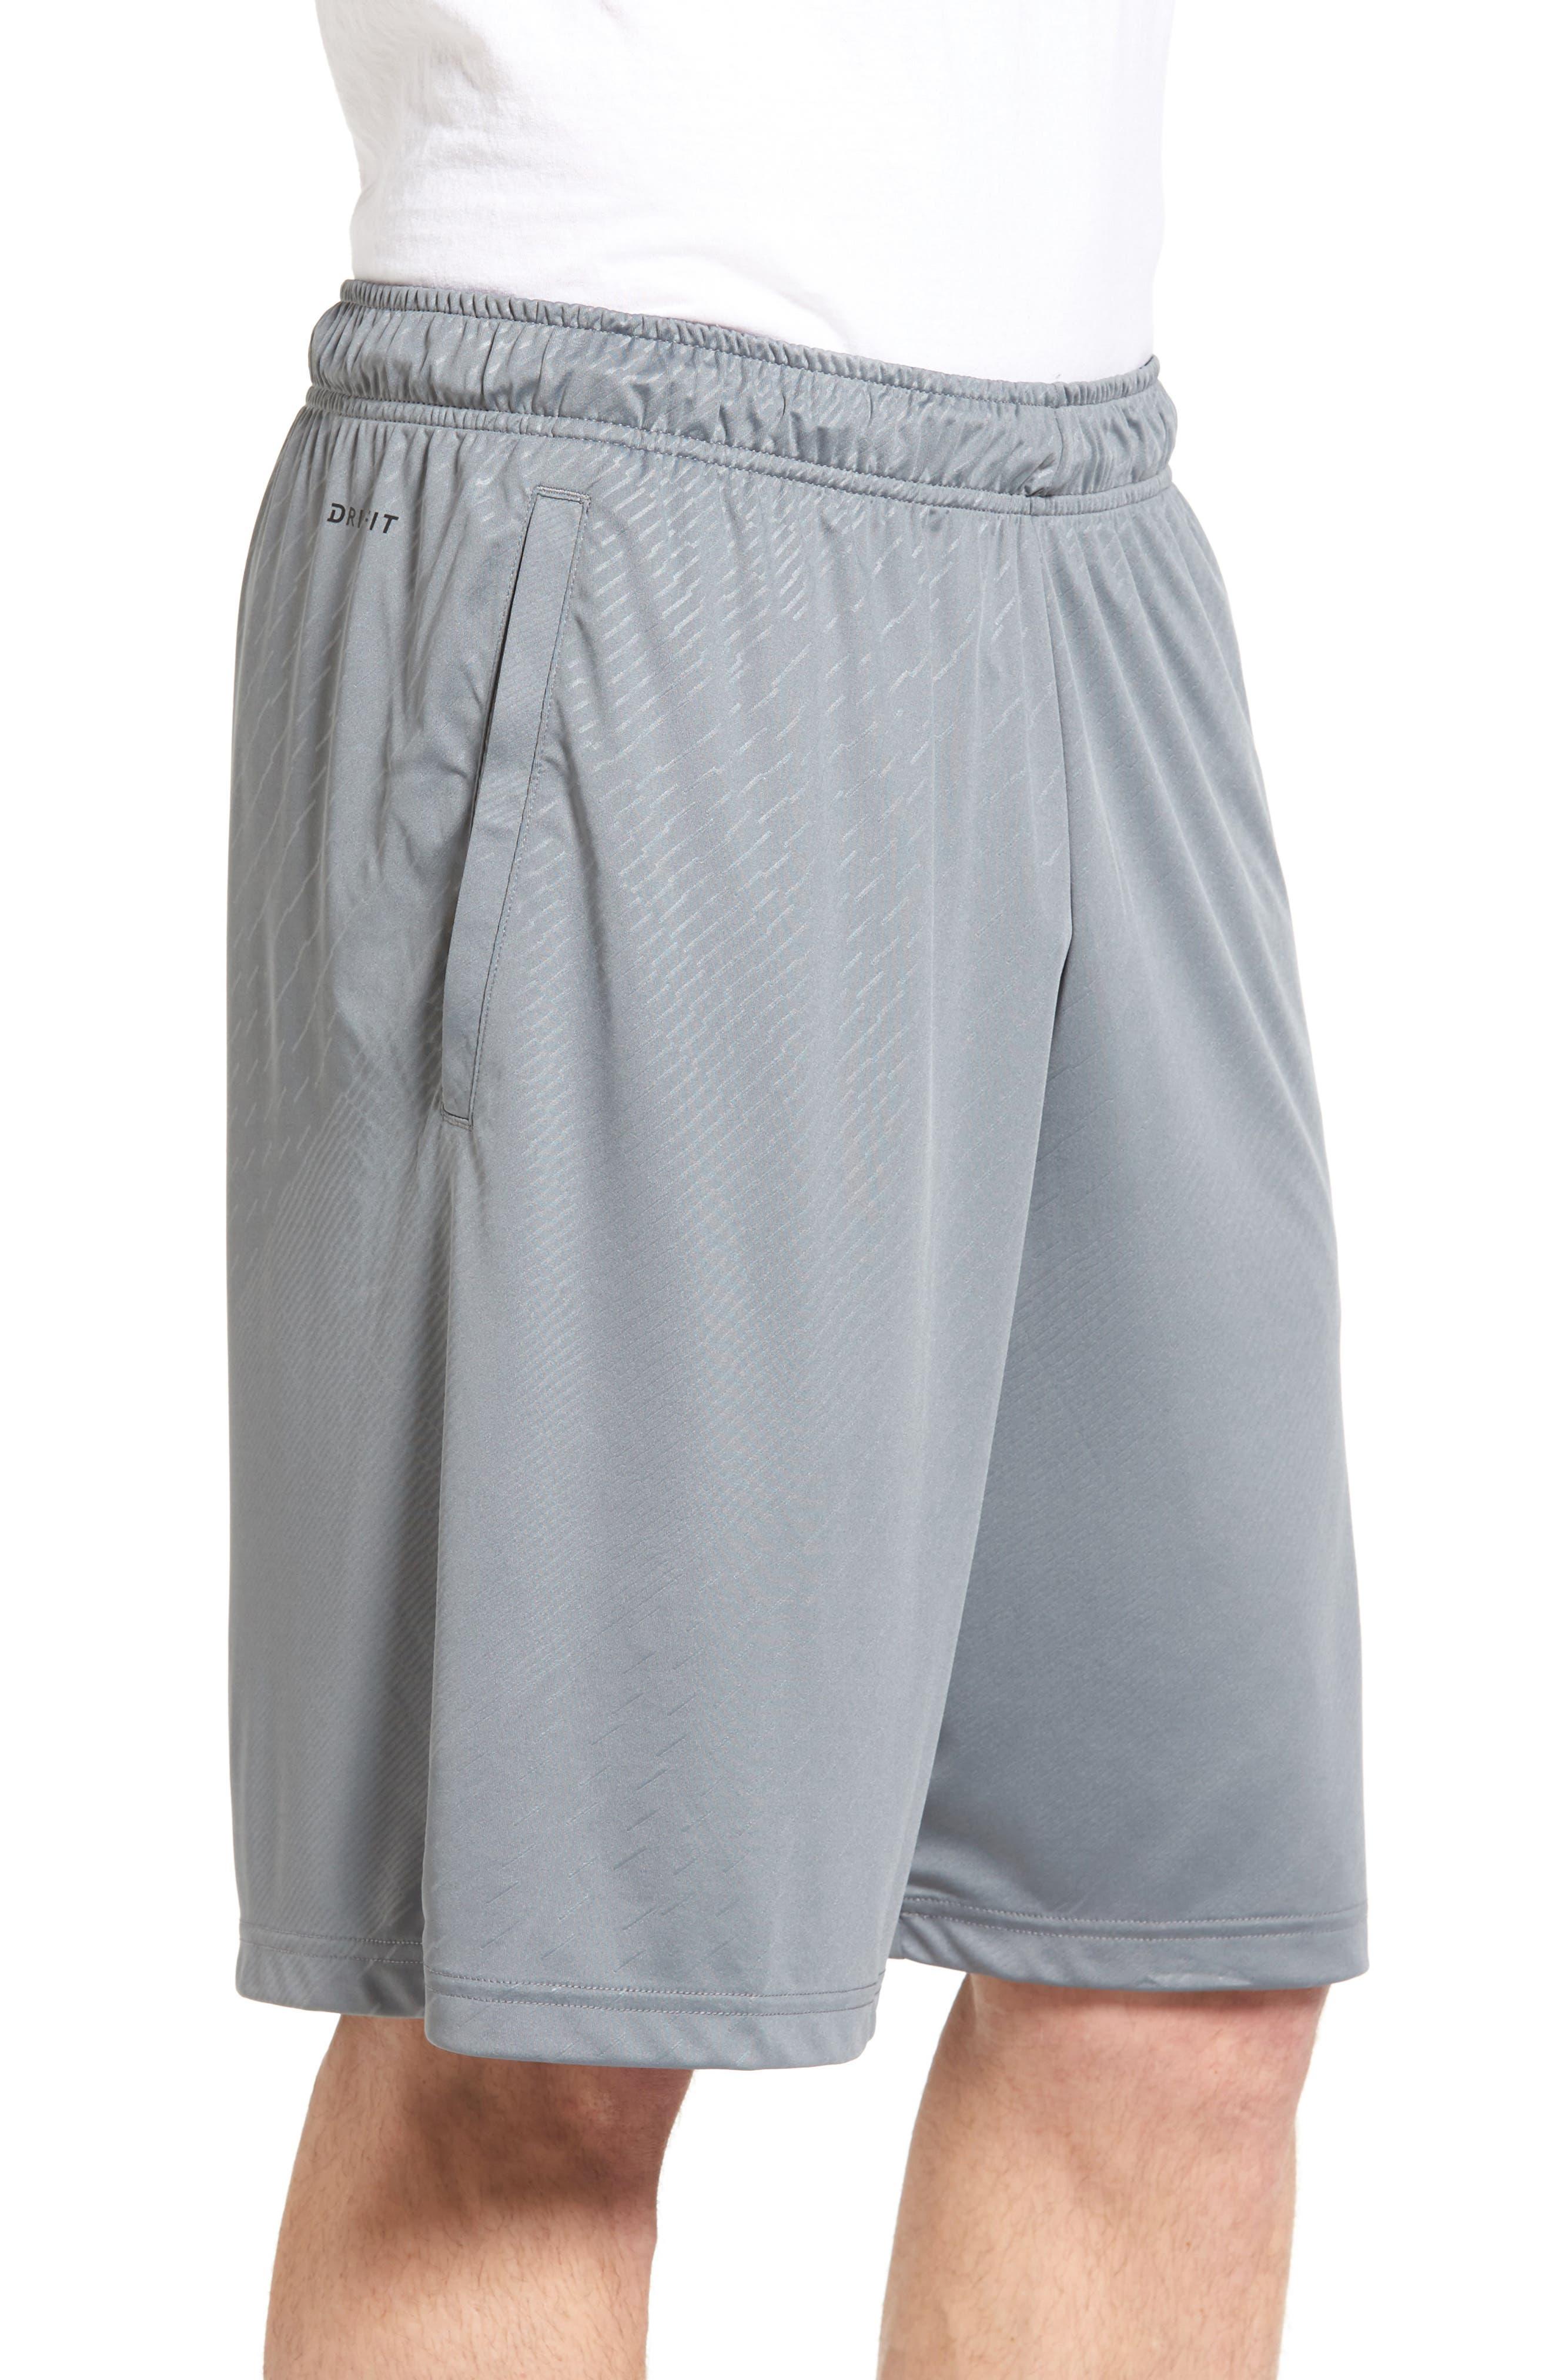 Dry Training Shorts,                             Alternate thumbnail 6, color,